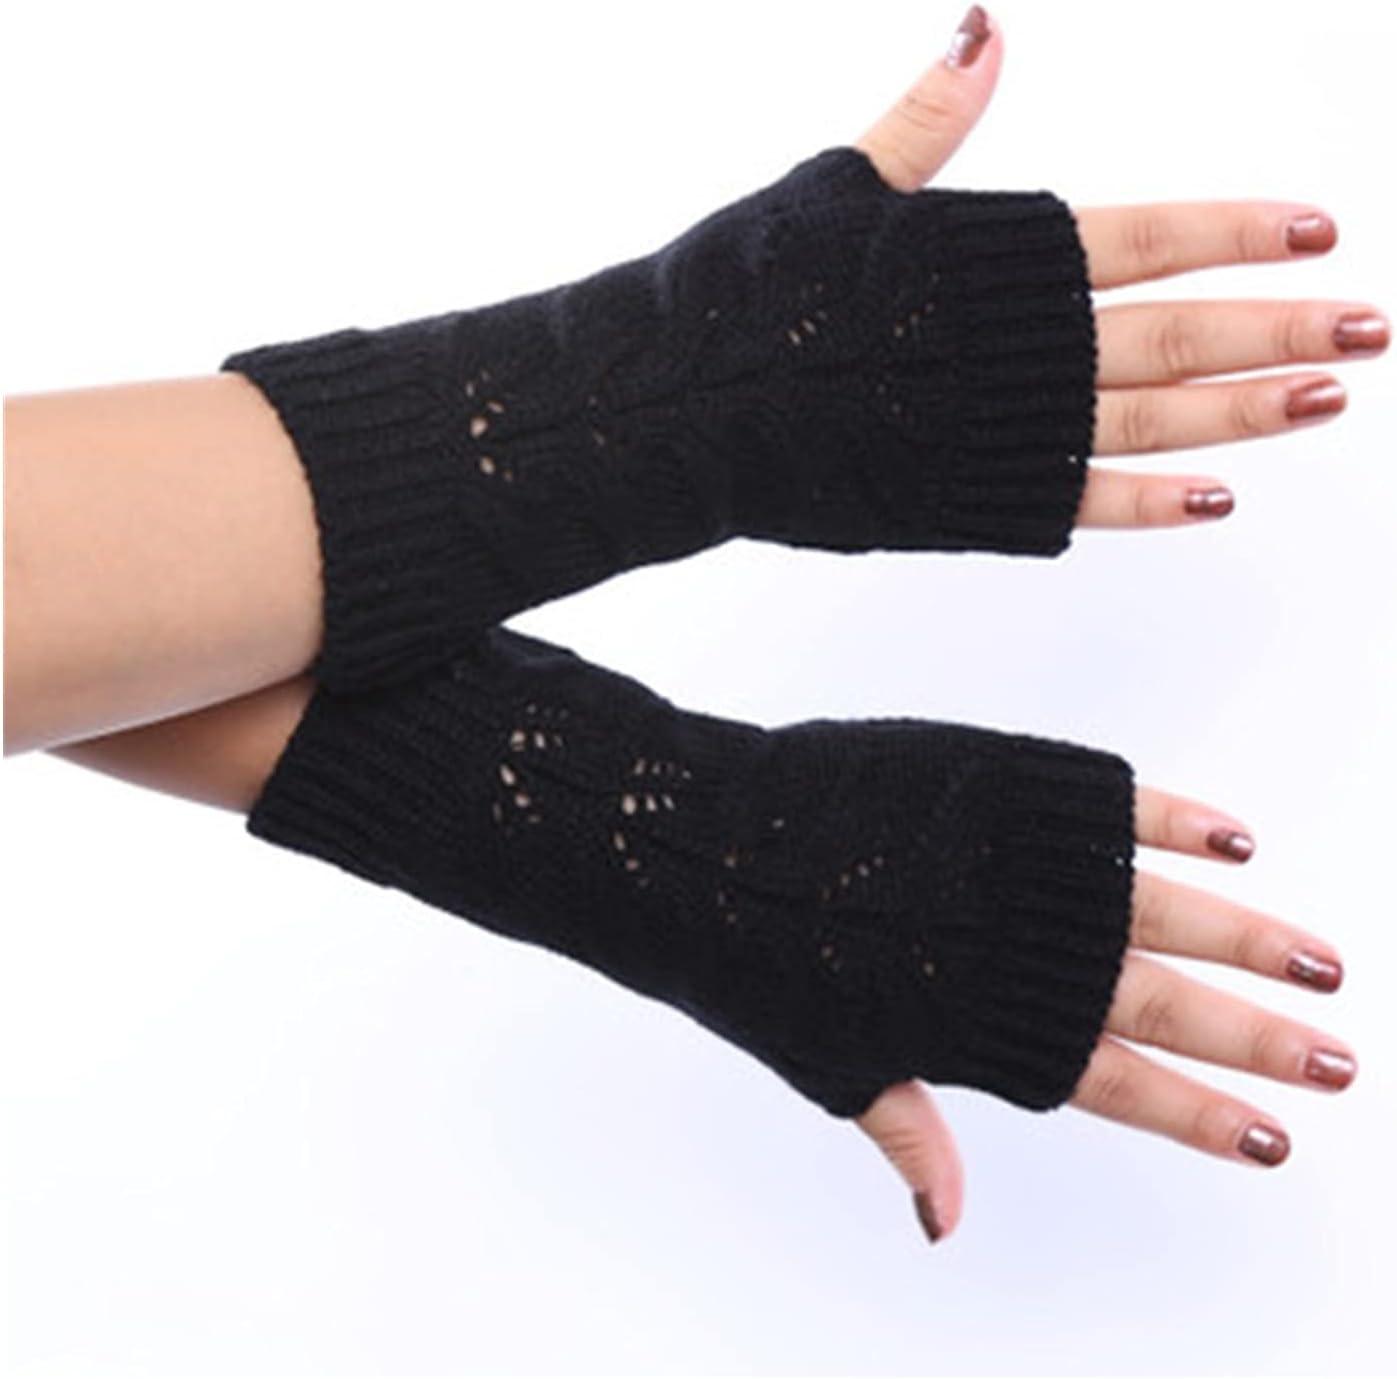 YSJJSQZ Winter Gloves Fashion Women Soft Wool Elastic Knit Twist Hollow Thicken Warm Mittens Unisex Winter Half Finger Driving Gloves (Color : Black, Gloves Size : 20cm)